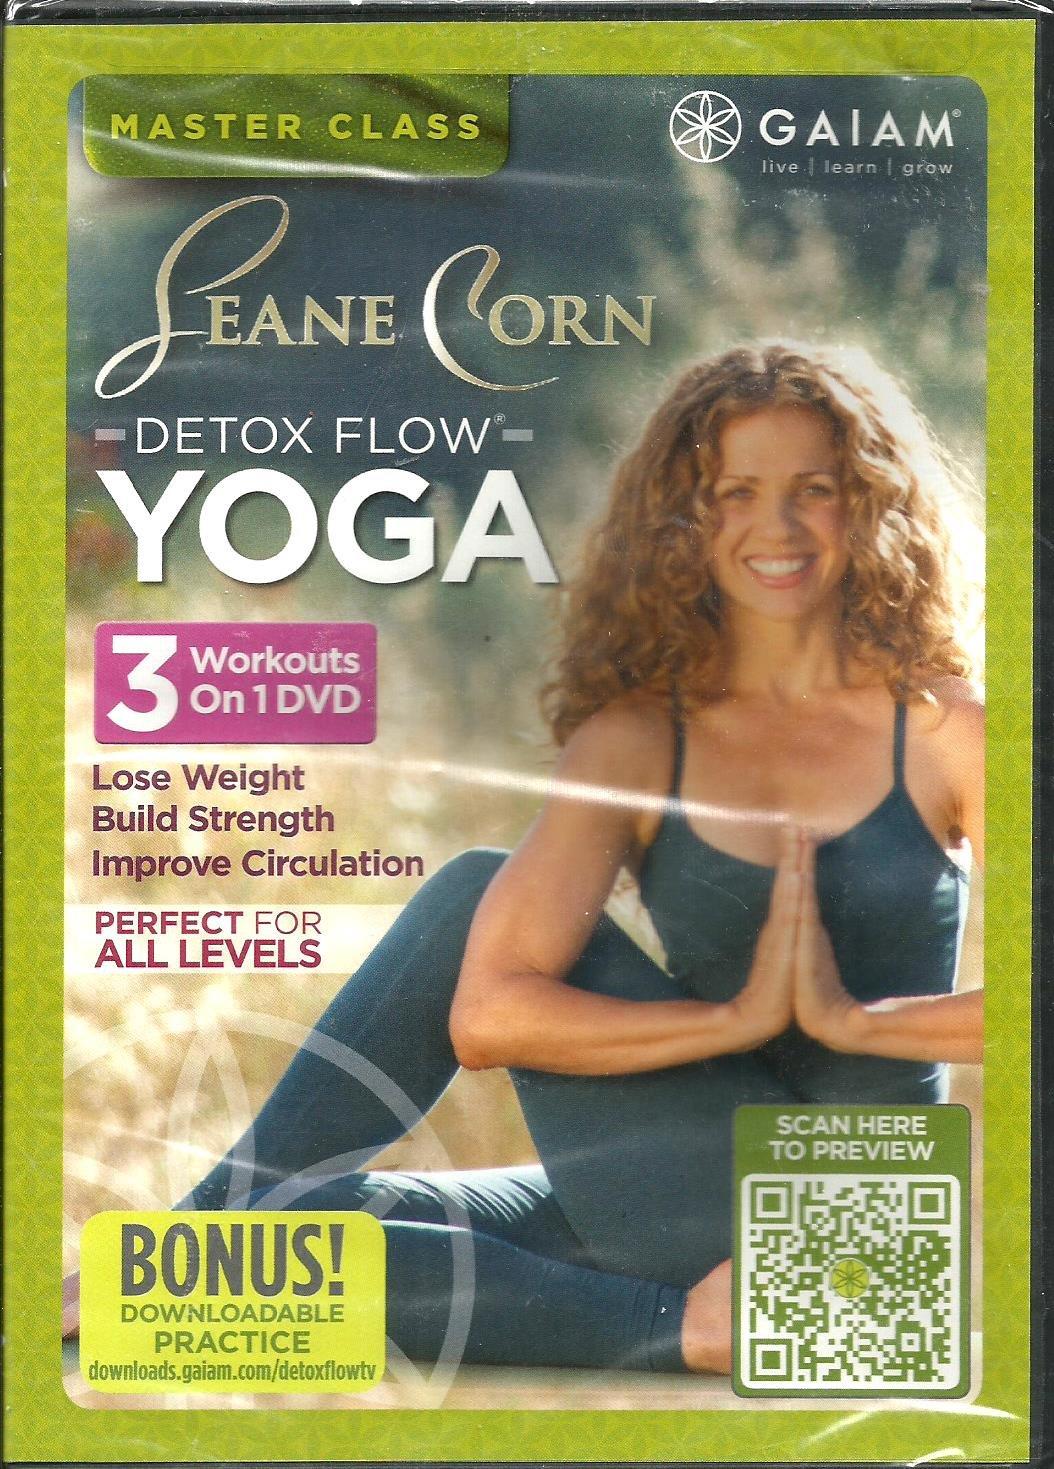 Gaiam Seane Corn Detox Flow Yoga DVD 3 Workouts on 1 DVD - Lose Weight, Build Strength, Improve Circulation